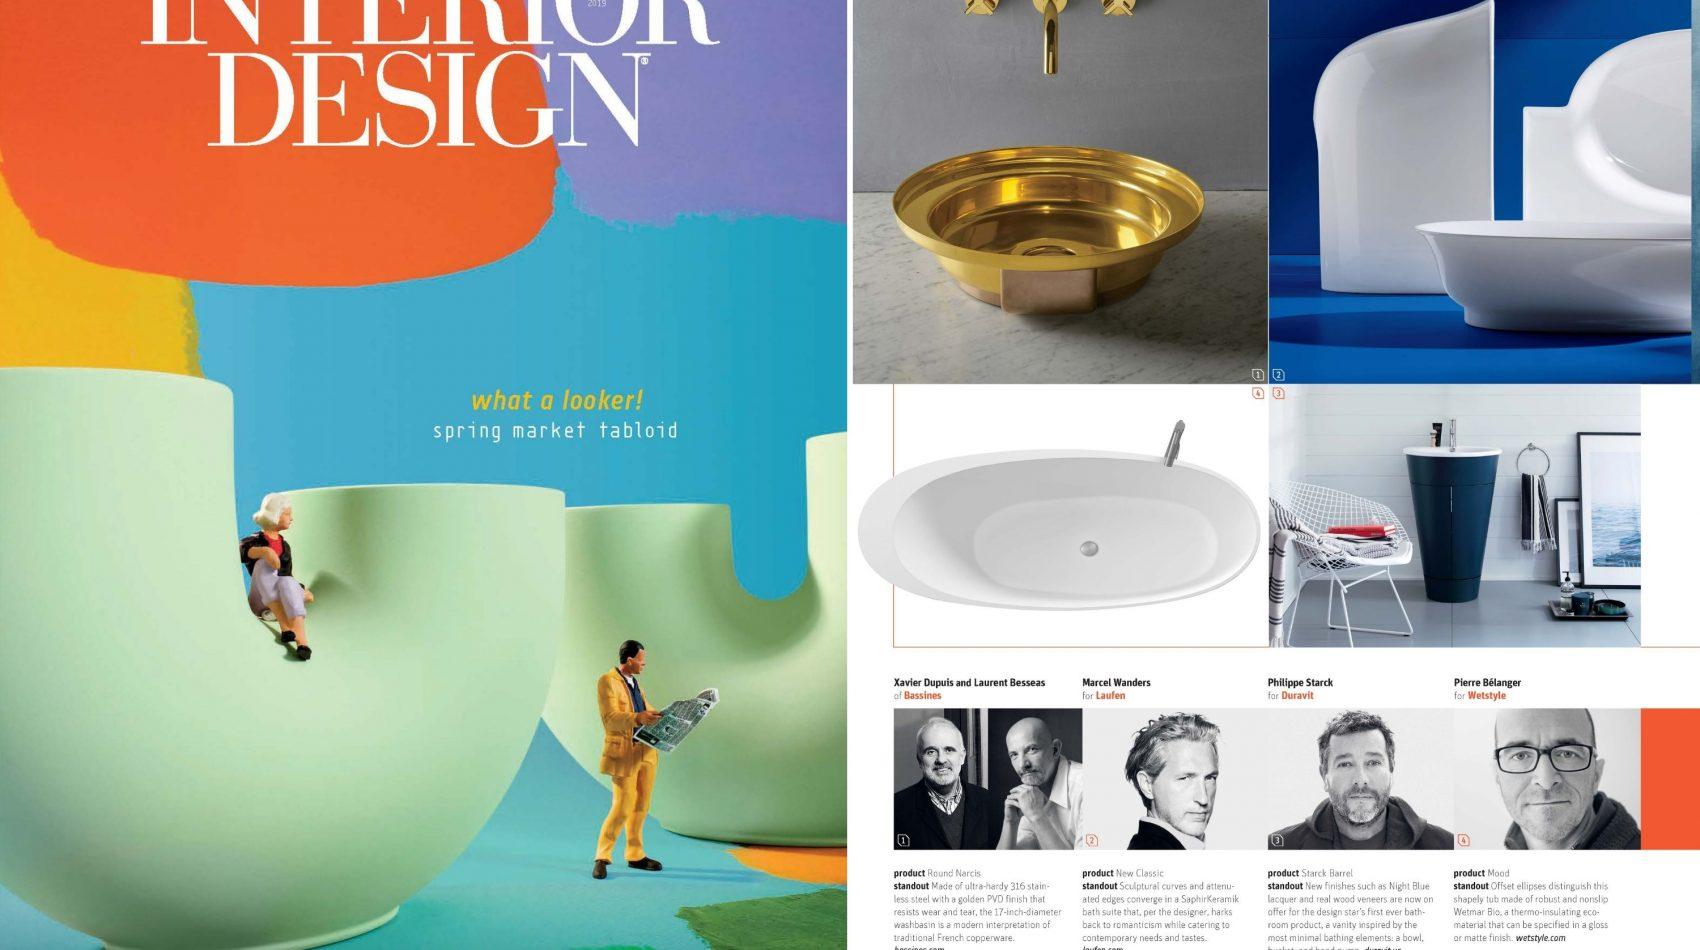 Mood Bathtub in Interior Design Spring Market Tabloid 2019